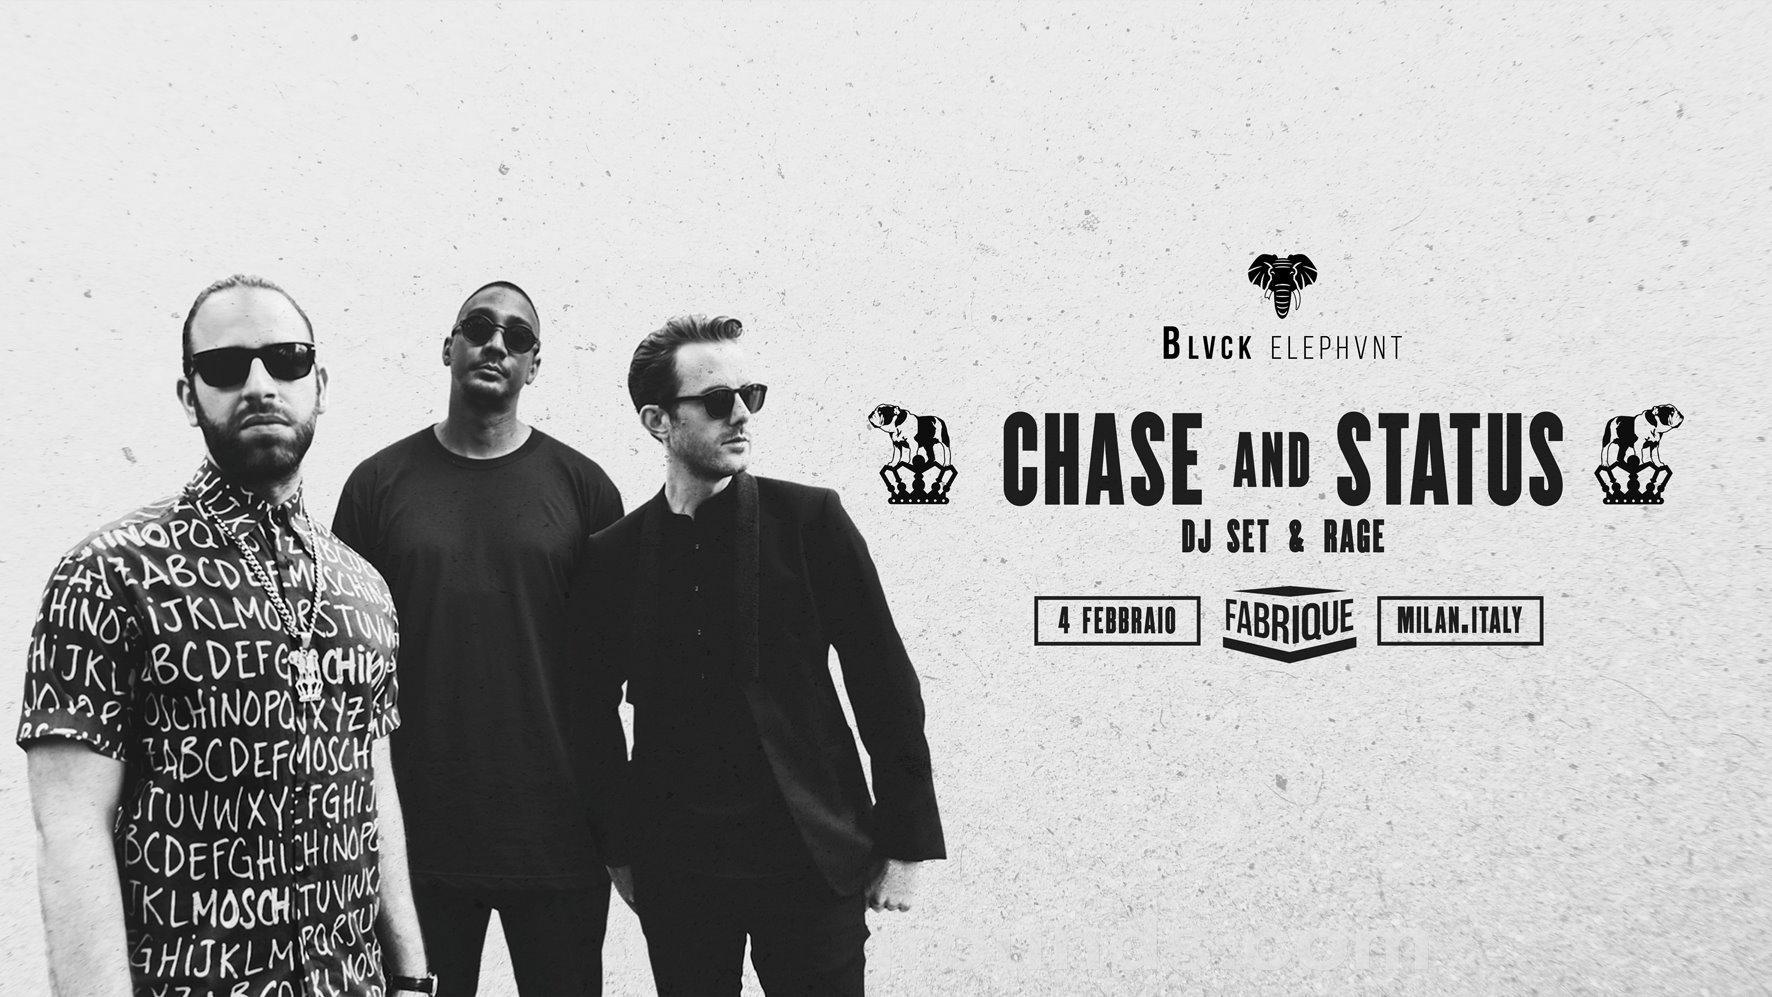 Chase and Status – Fabrique – Milano – Sabato 4 Febbraio 2017